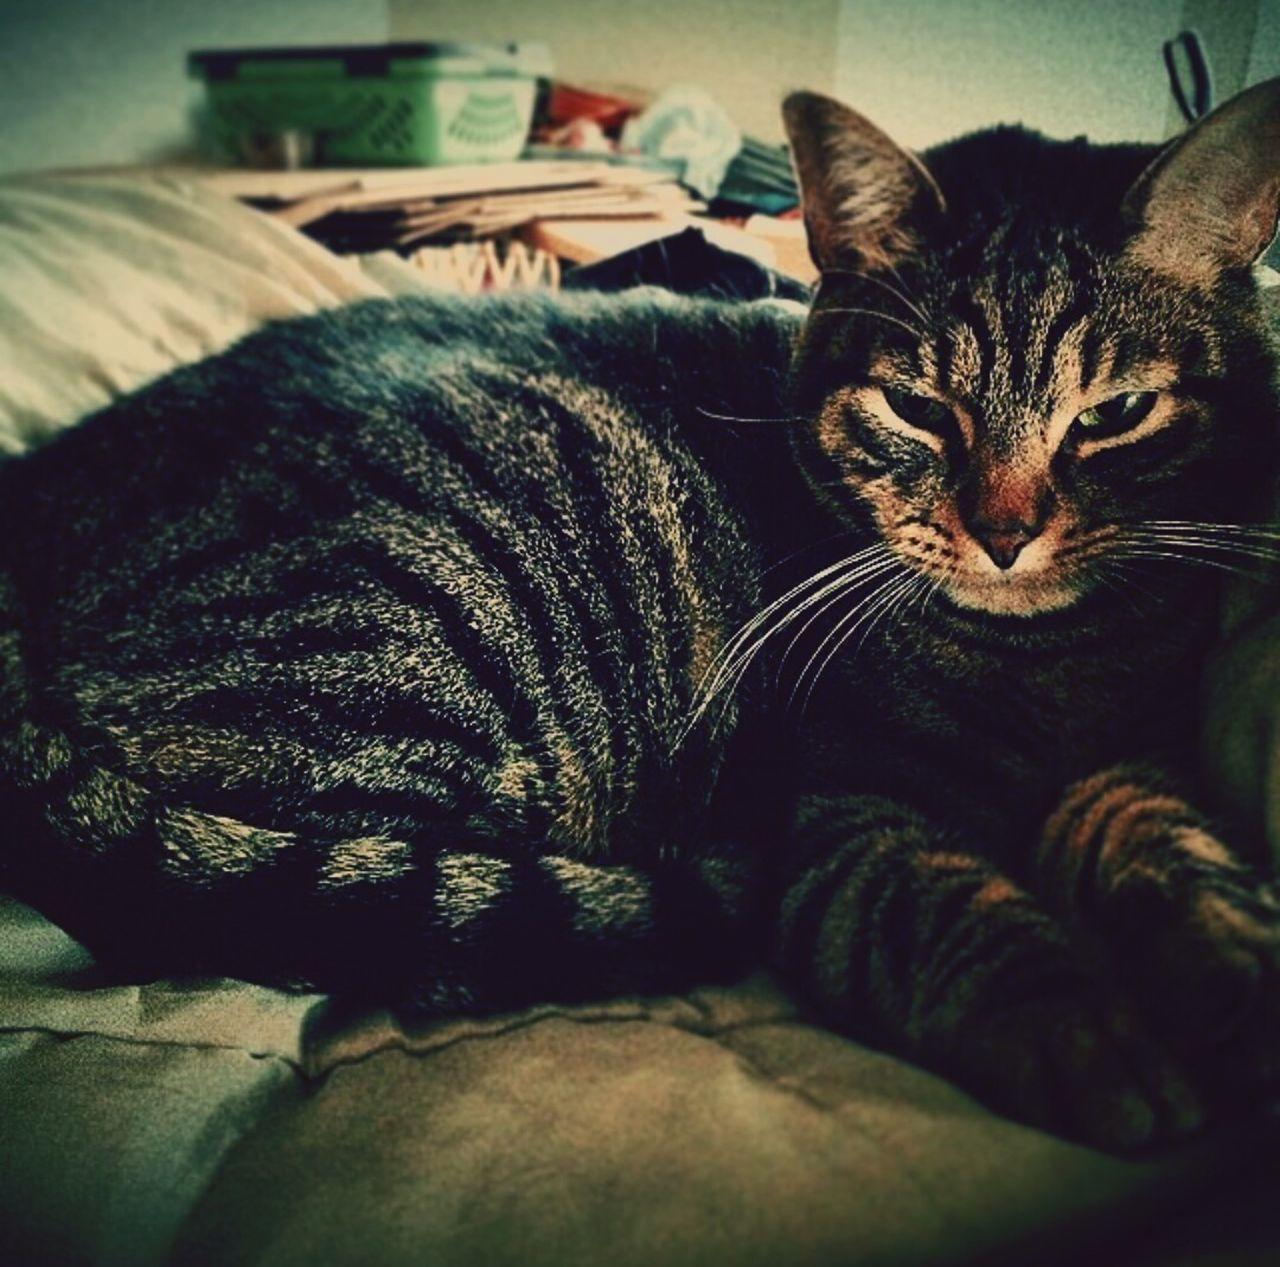 Cat Cats Kitty Kitty Cat Snugglebuddy Fuzzy Pets